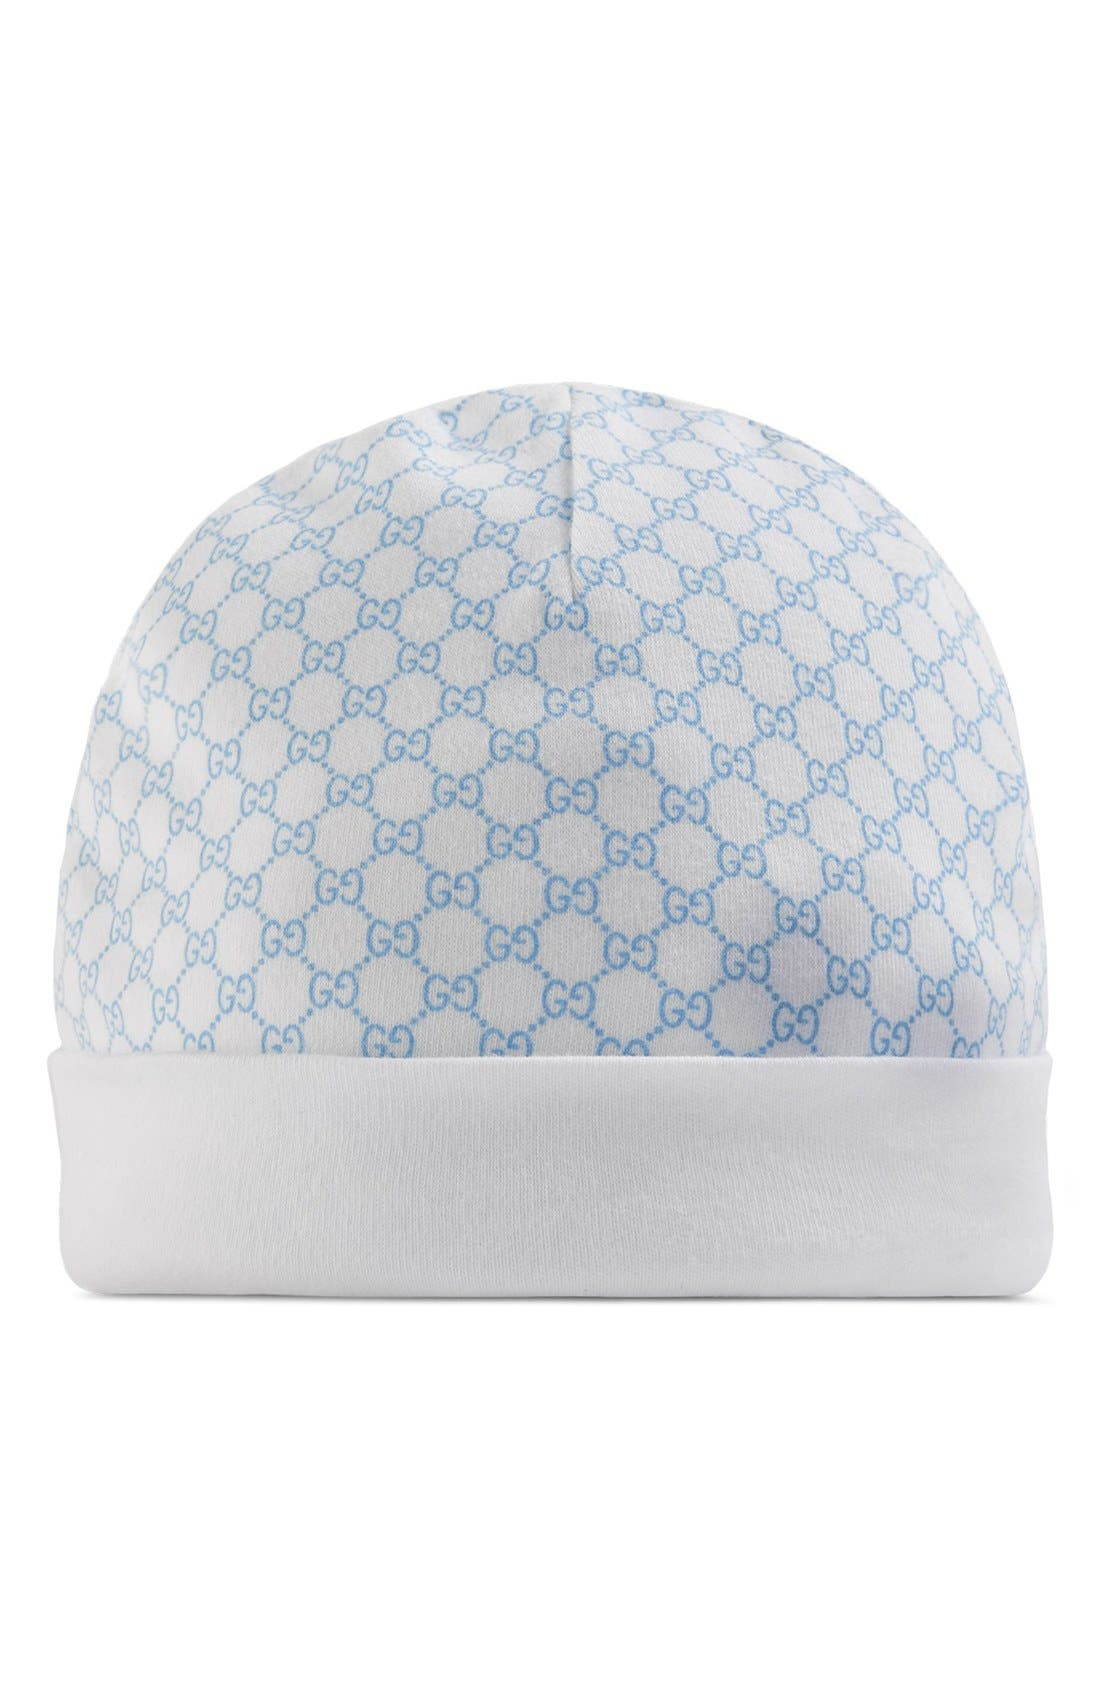 GUCCI Logo Knit Hat